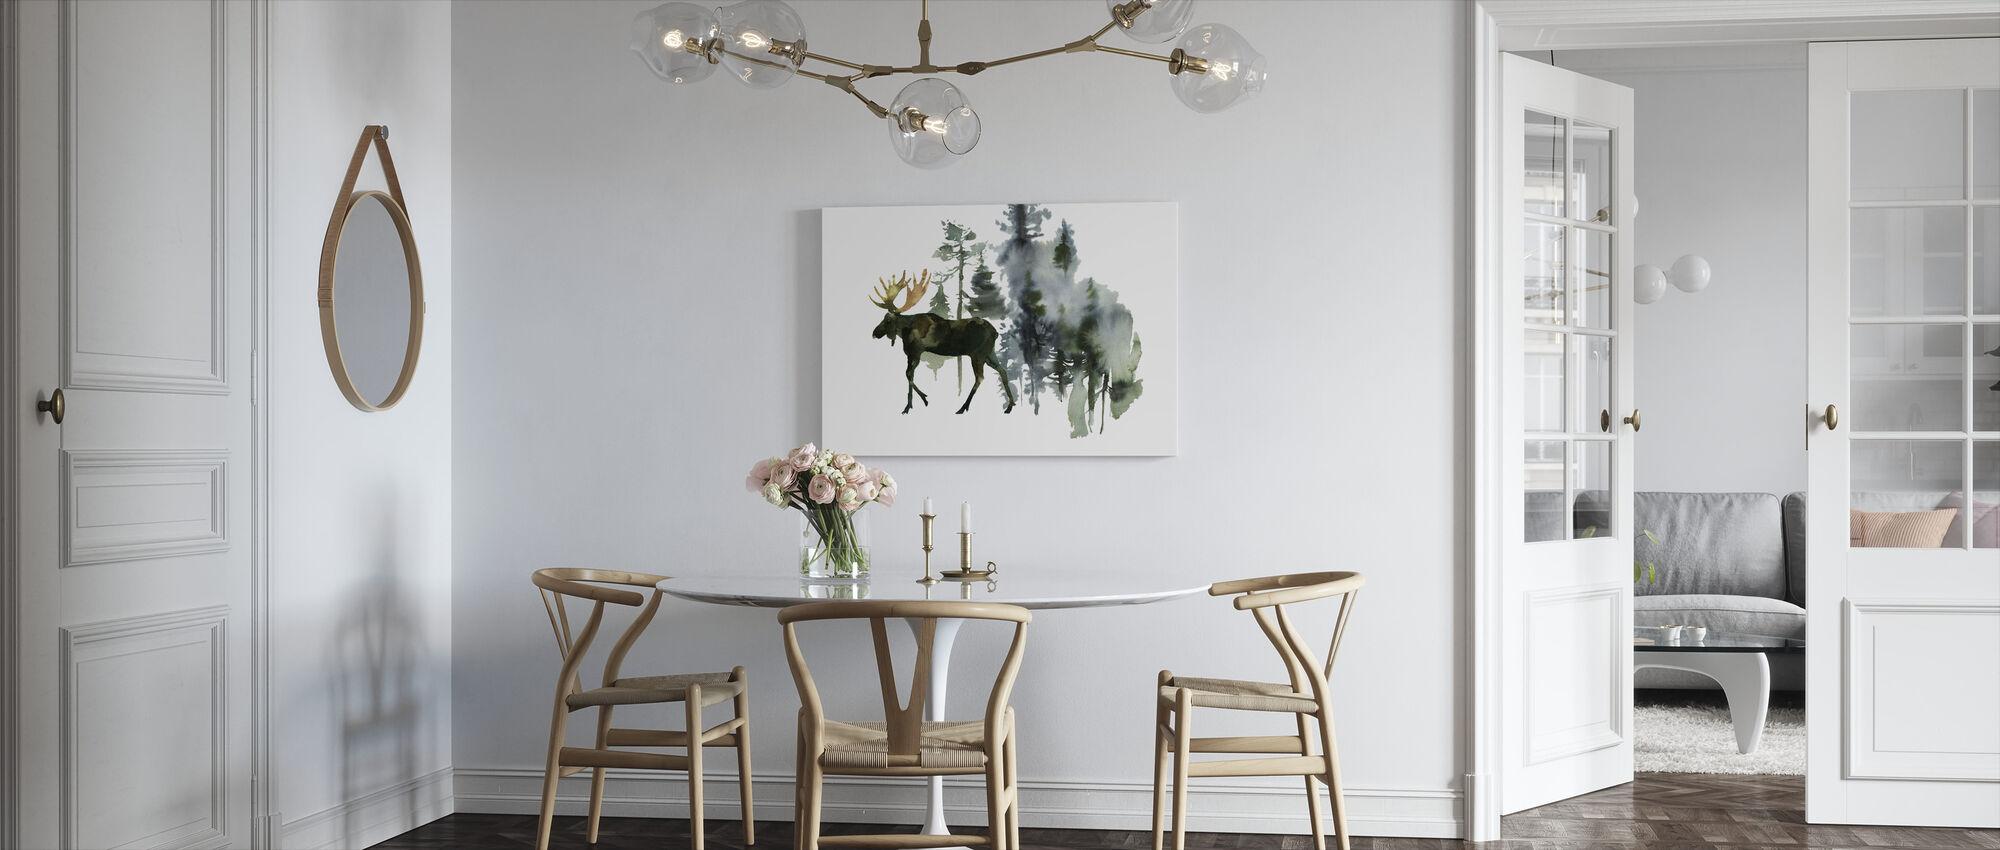 Aquarel Eland in Bos - Canvas print - Keuken